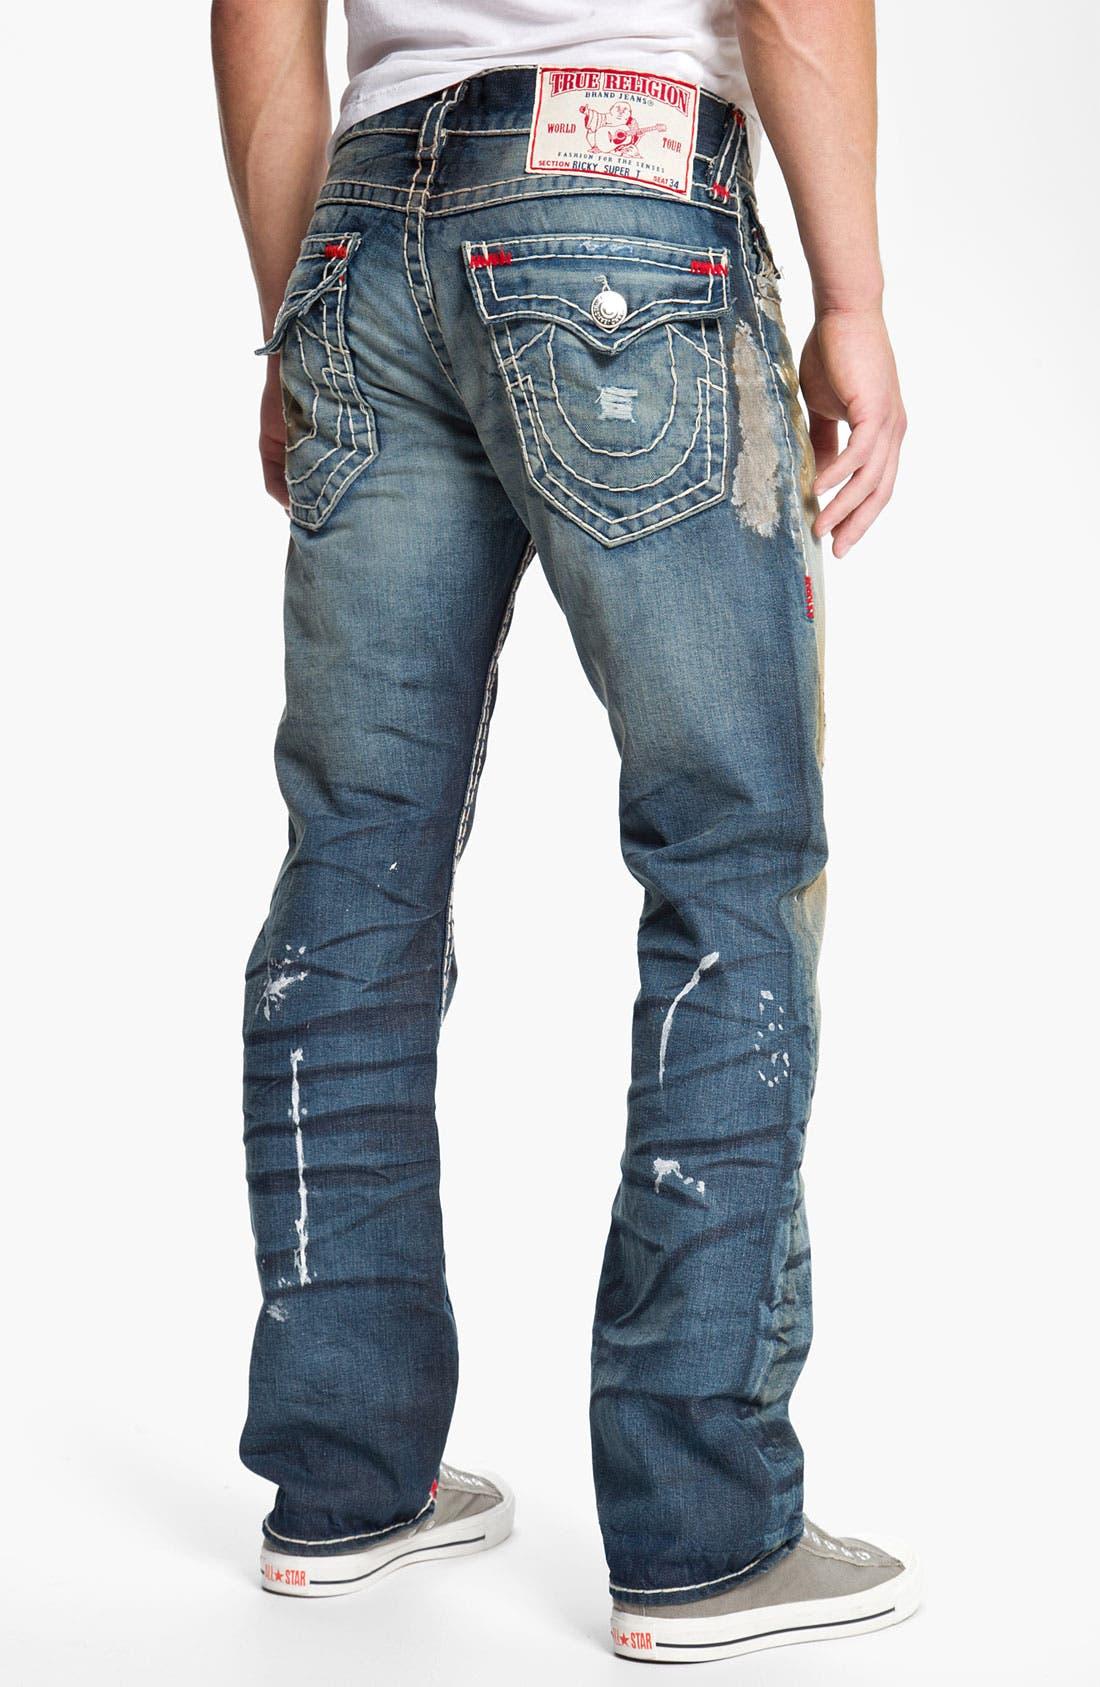 Main Image - True Religion Brand Jeans 'Ricky' Straight Leg Jeans (Bounty)